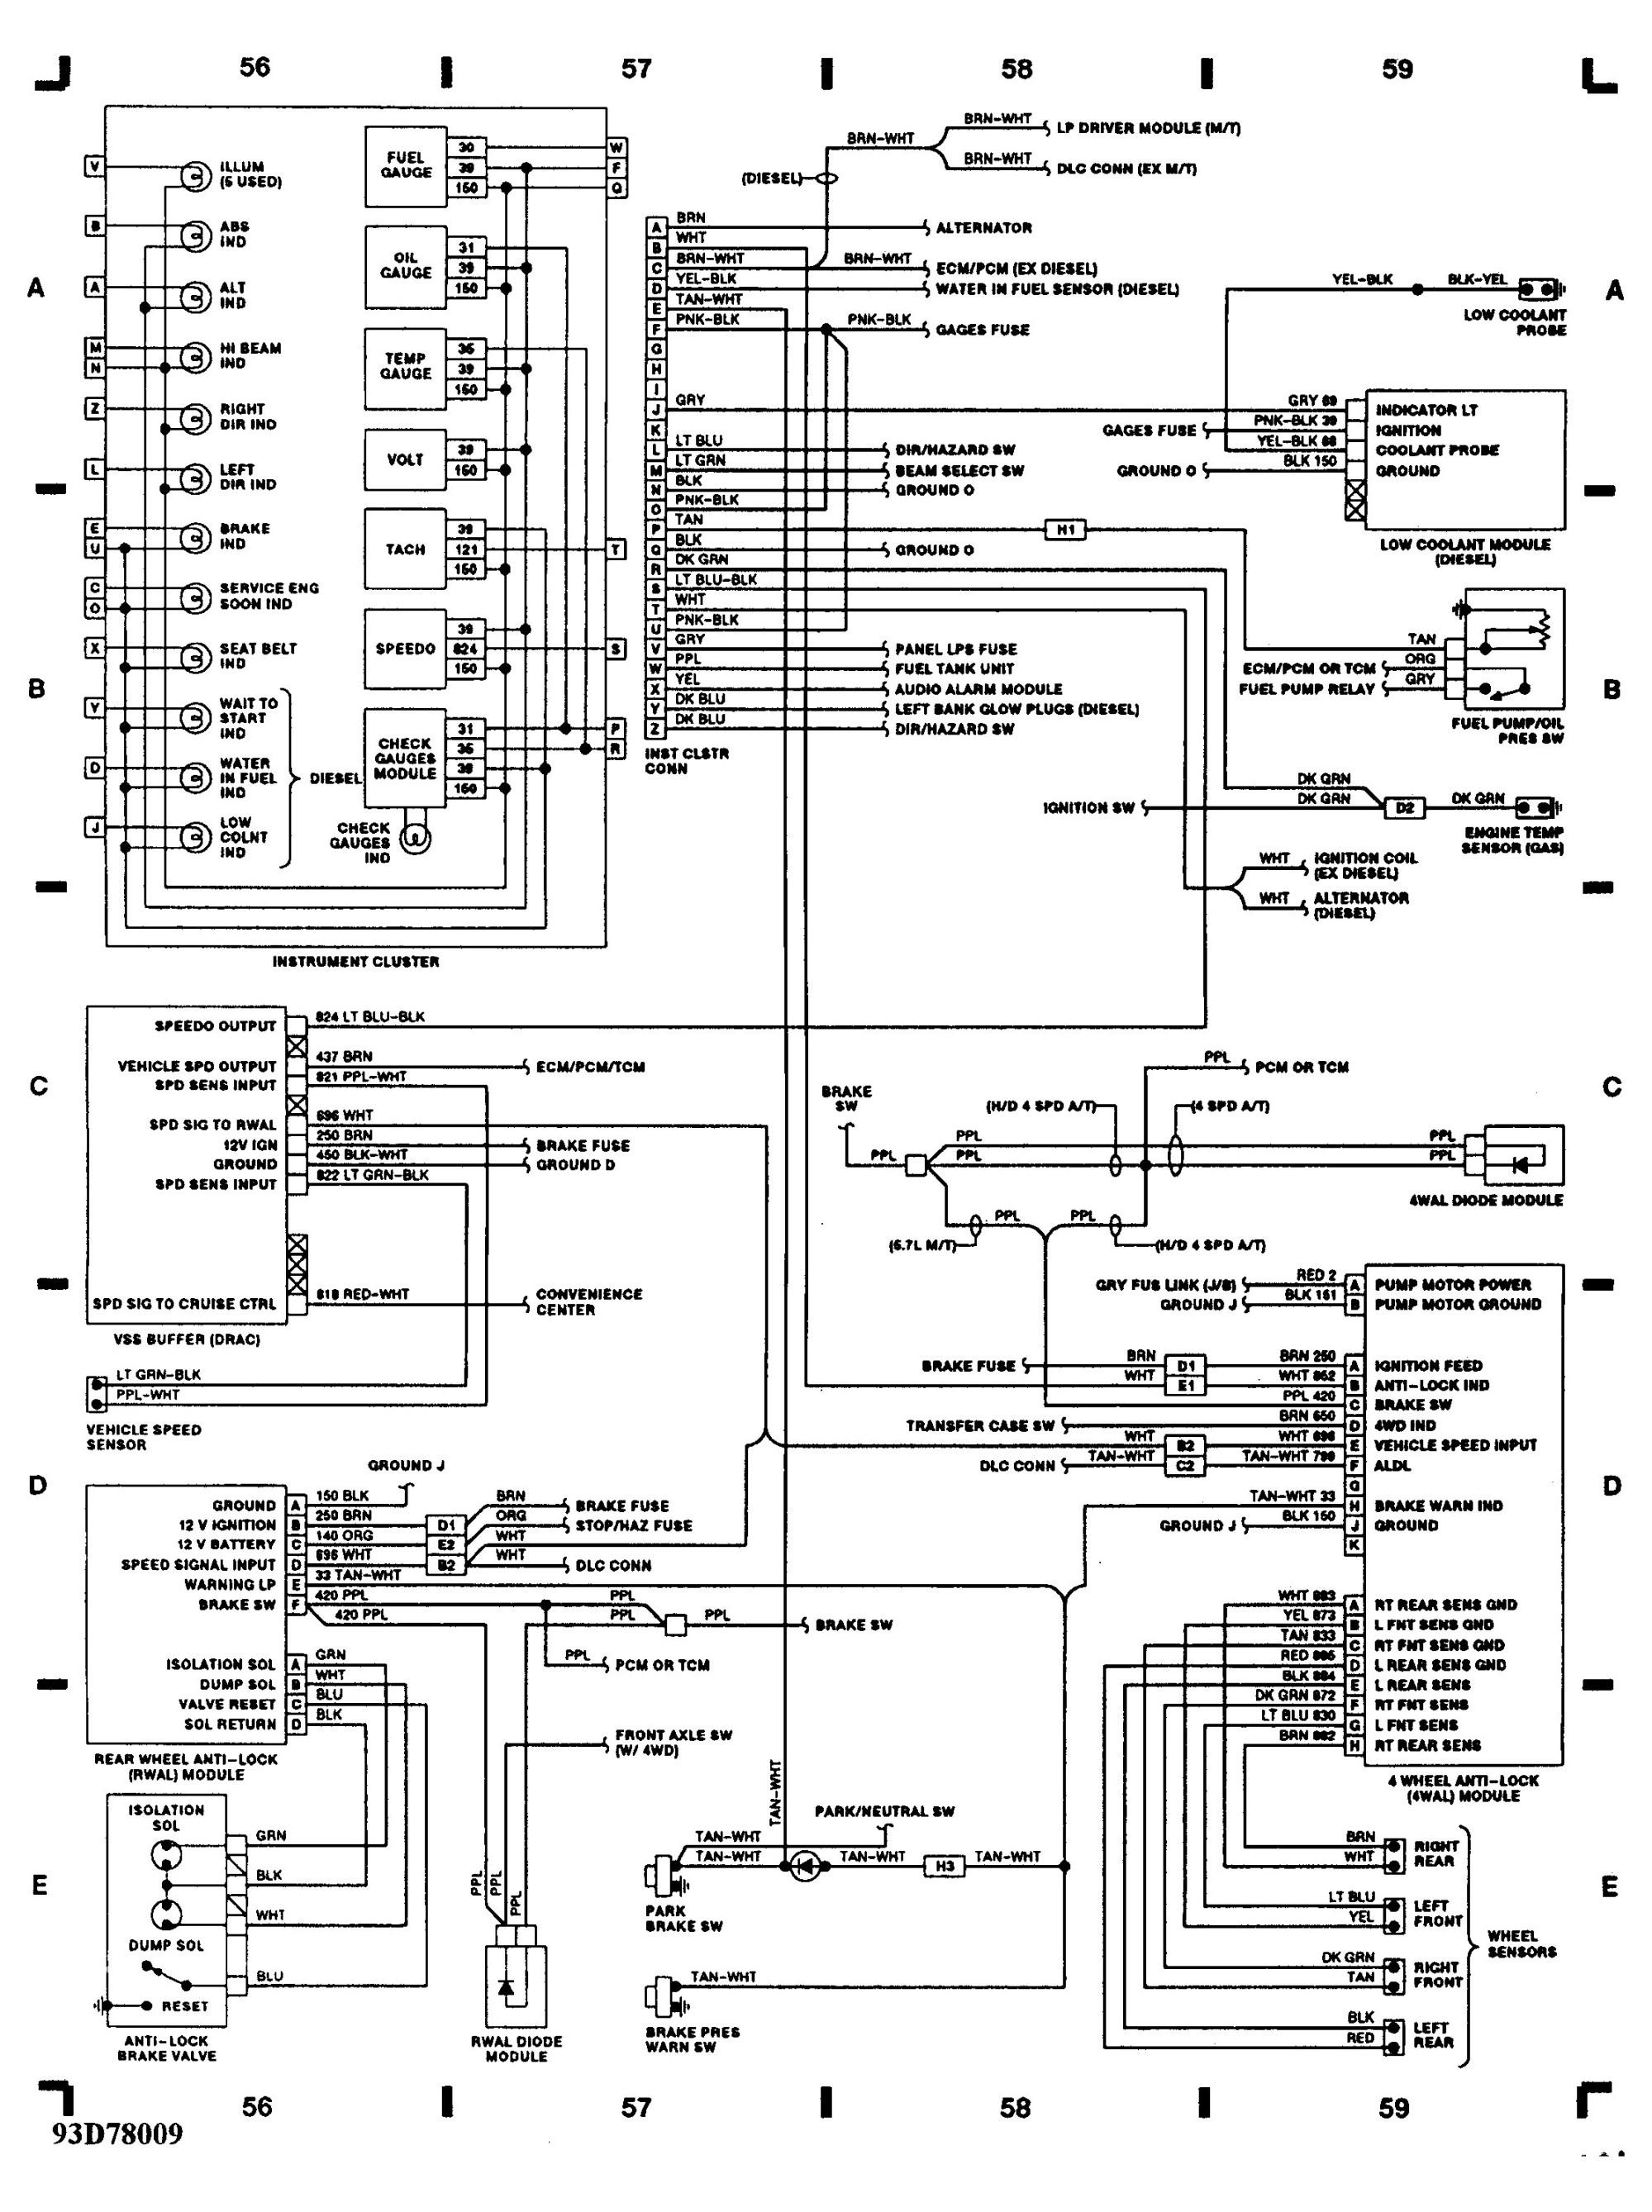 hight resolution of mazda b3000 engine diagram my wiring diagram rh detoxicrecenze com 2001 mazda b3000 engine diagram mazda